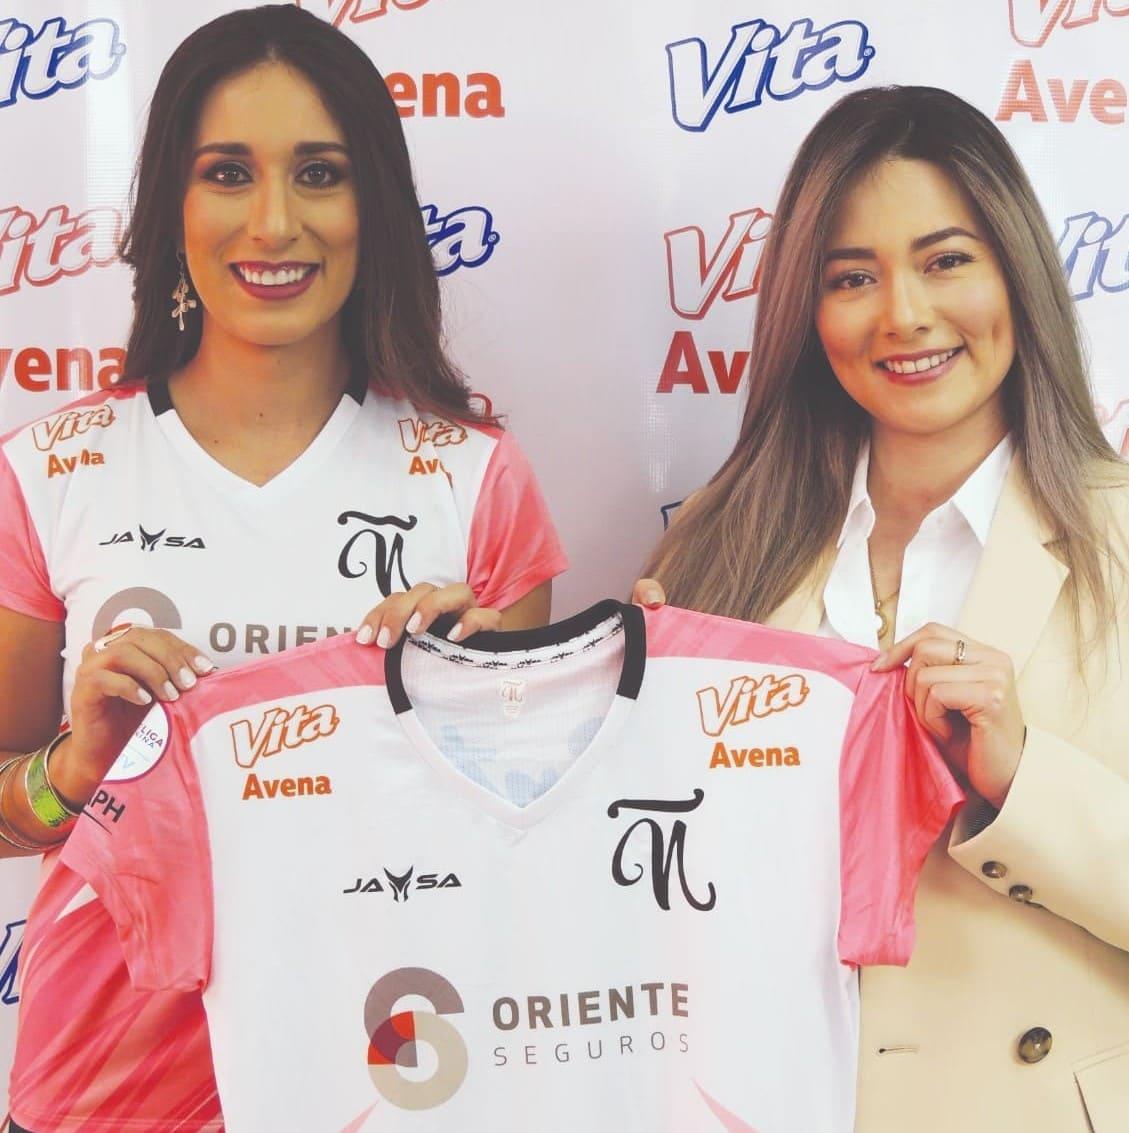 Vita apoya al fútbol femenino y auspicia al Club Ñañas